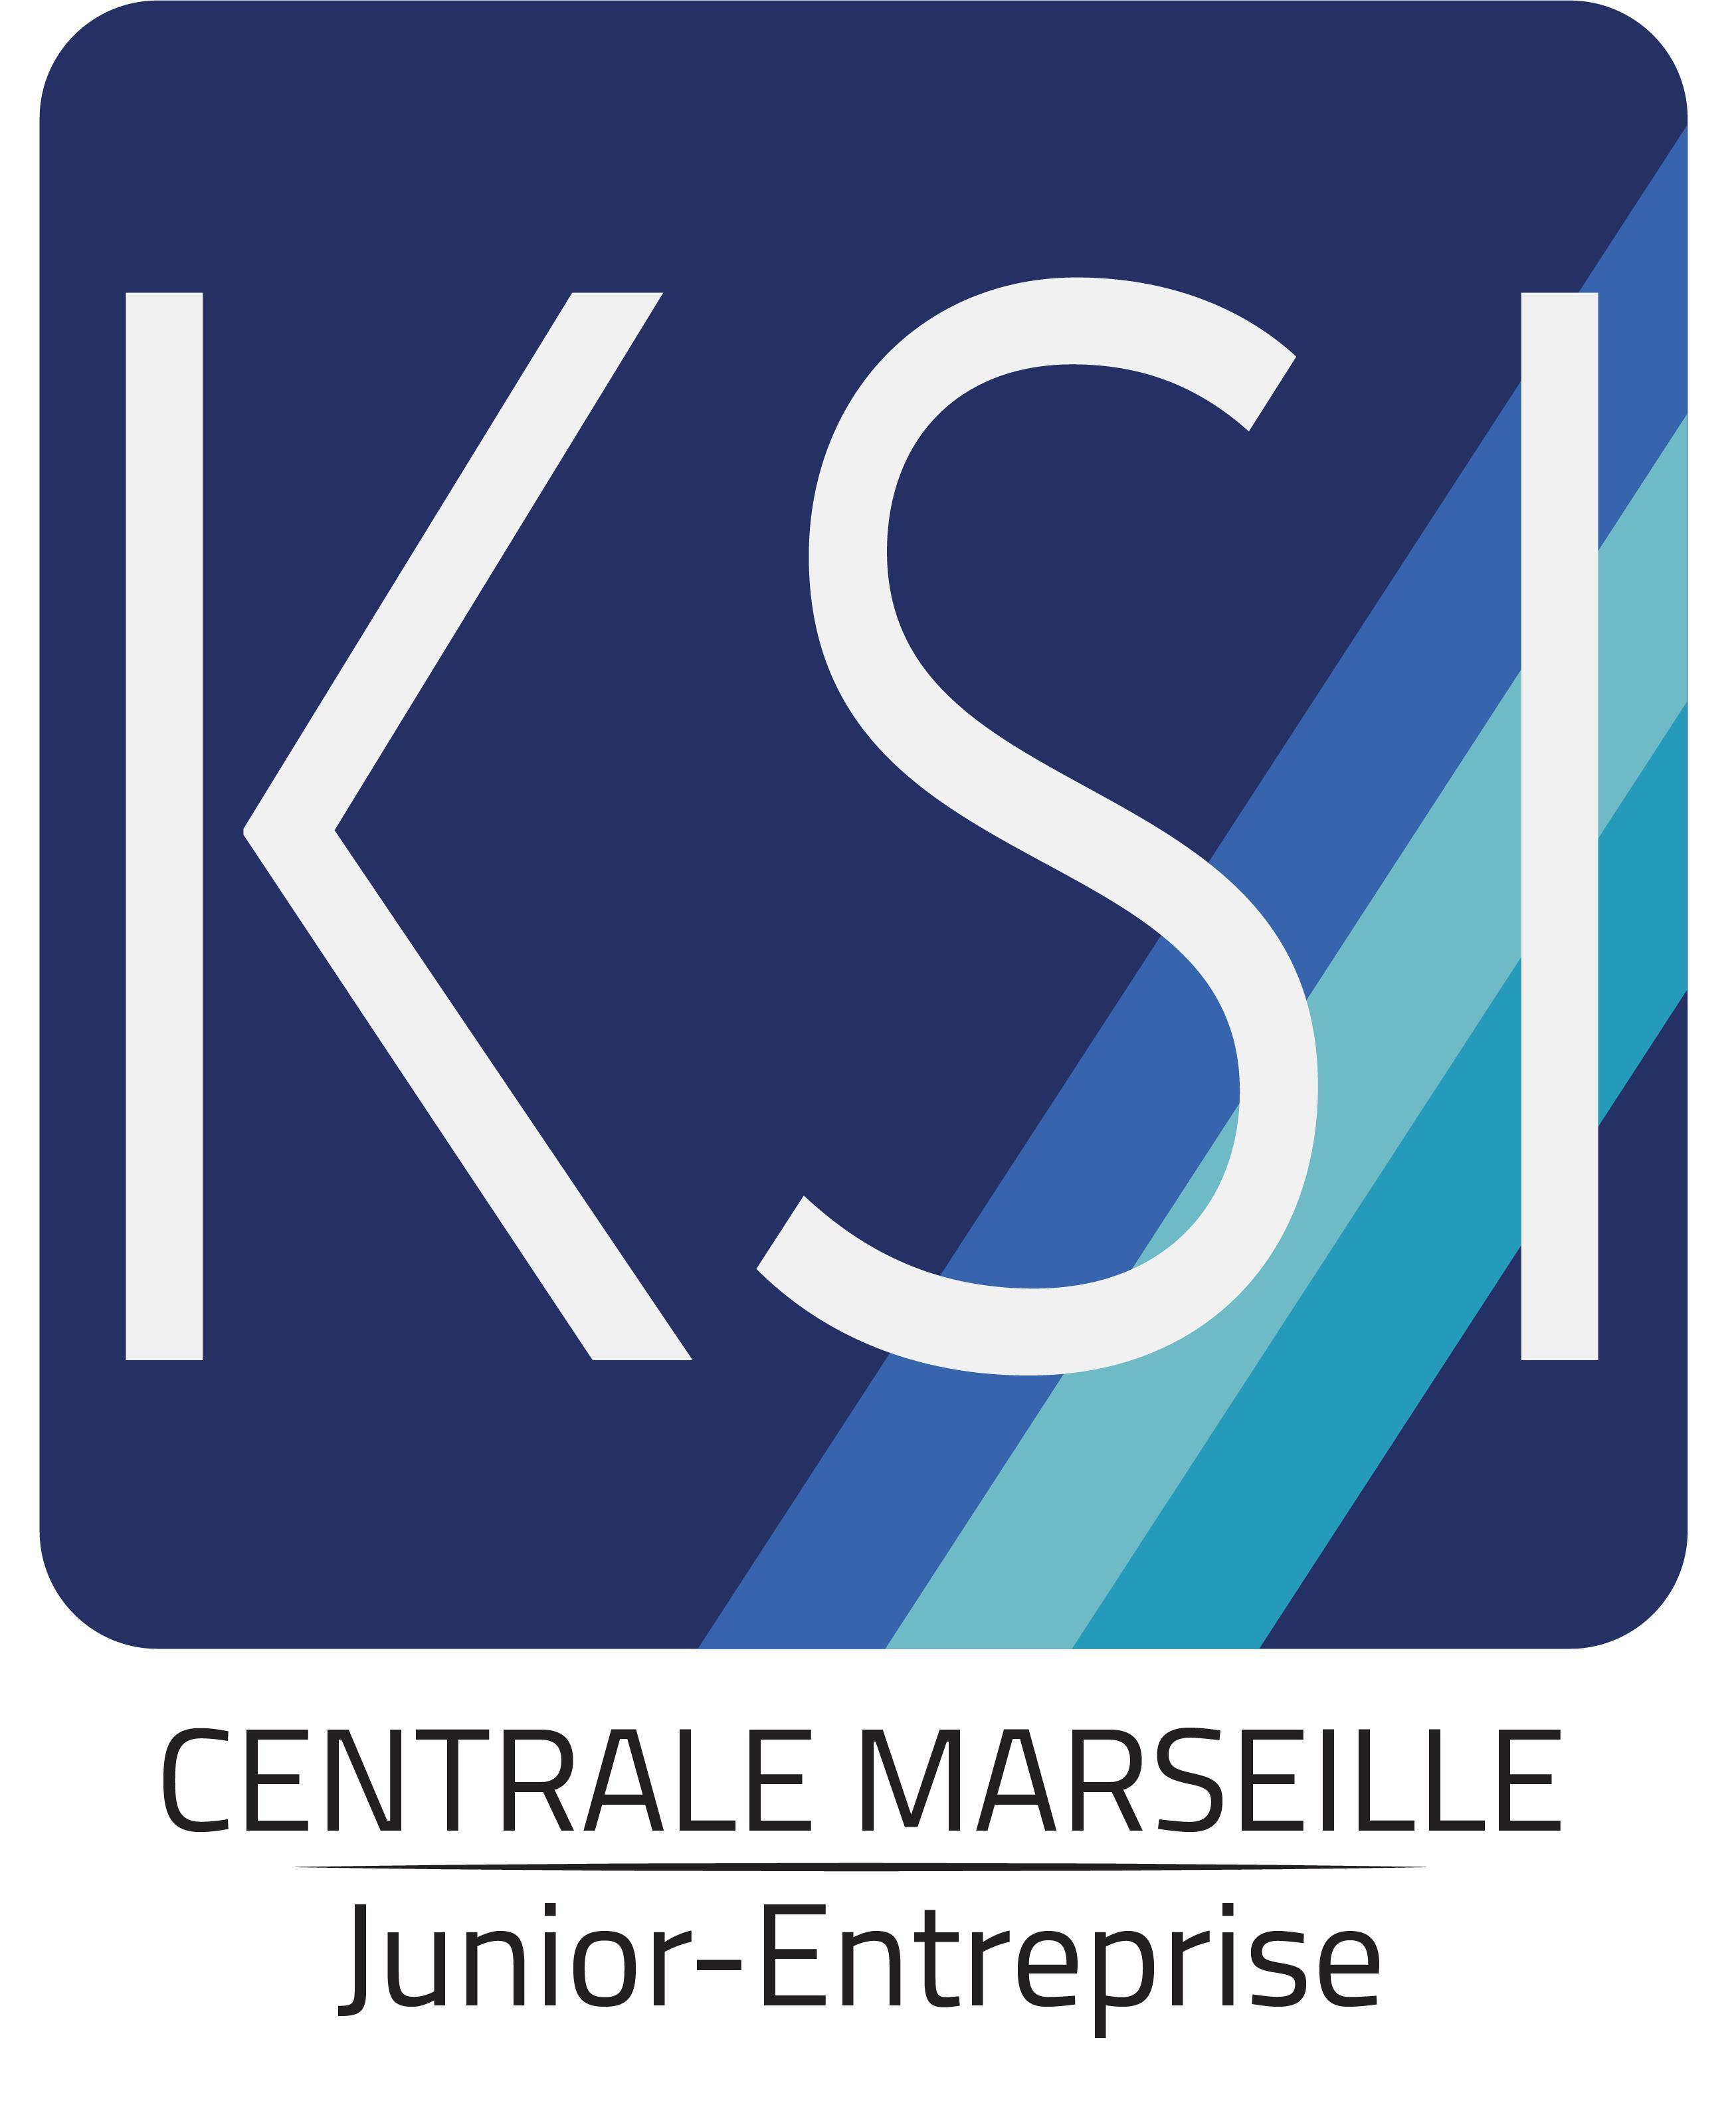 KSI Centrale Marseille